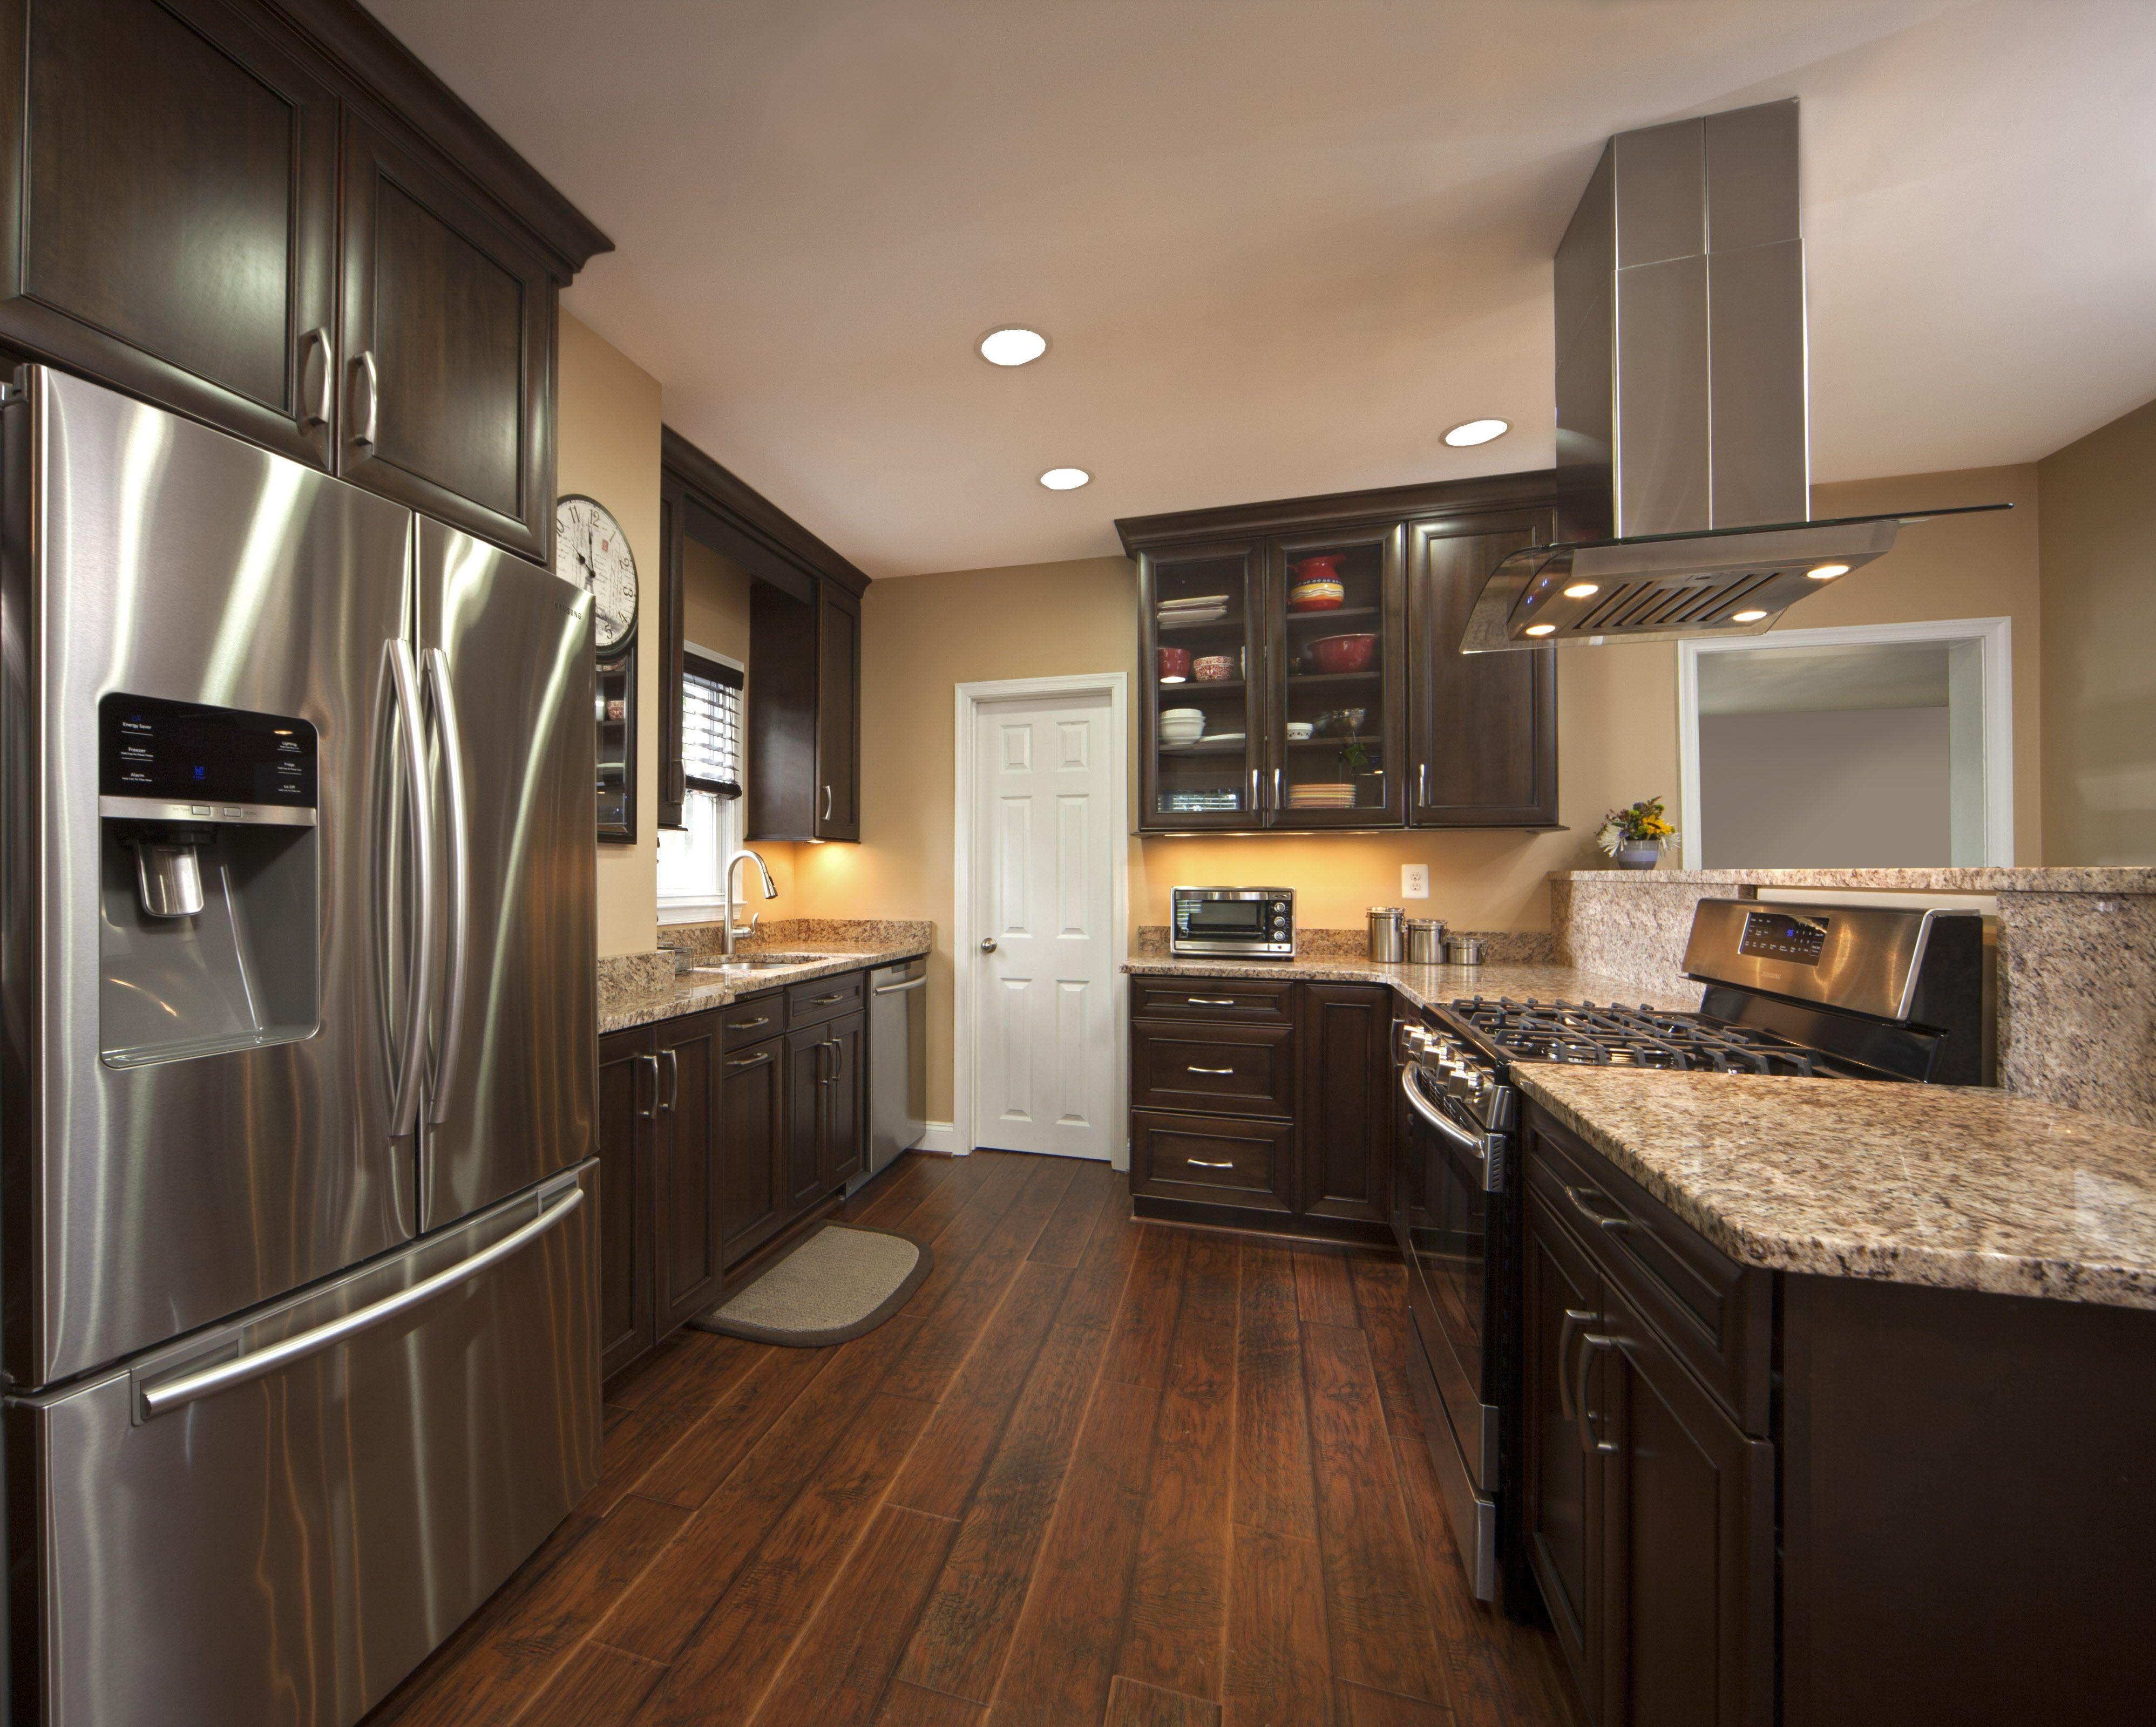 Kitchen Remodel under $60,000 Starcom Design Build - Kummer ...